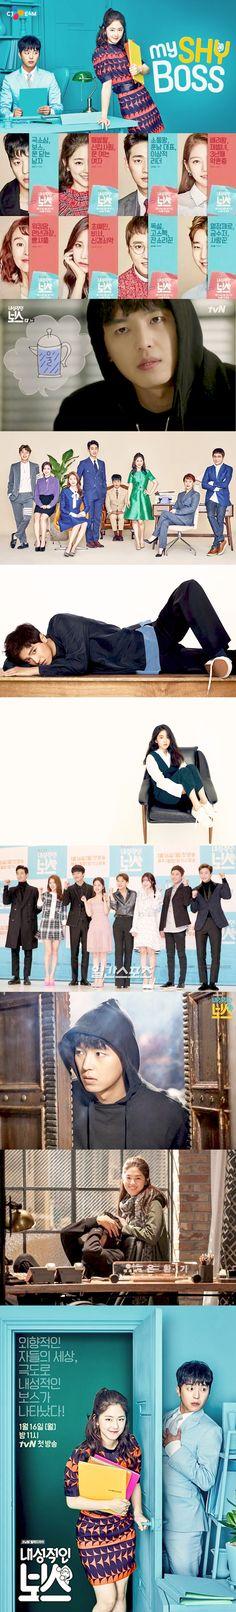 Shy Boss - Introverted Boss (내성적인 보스) - kdrama 2017 - 16 episodes / Yeon Woo-Jin / Park Hye-Soo / Yoon Park / Kong Seung-Yeon / Drama Korea, Korean Drama, My Shy Boss Kdrama, Introverted Boss, Yeon Woo Jin, Shin Min Ah, Park Bo Young, Joo Hyuk, Drama Queens